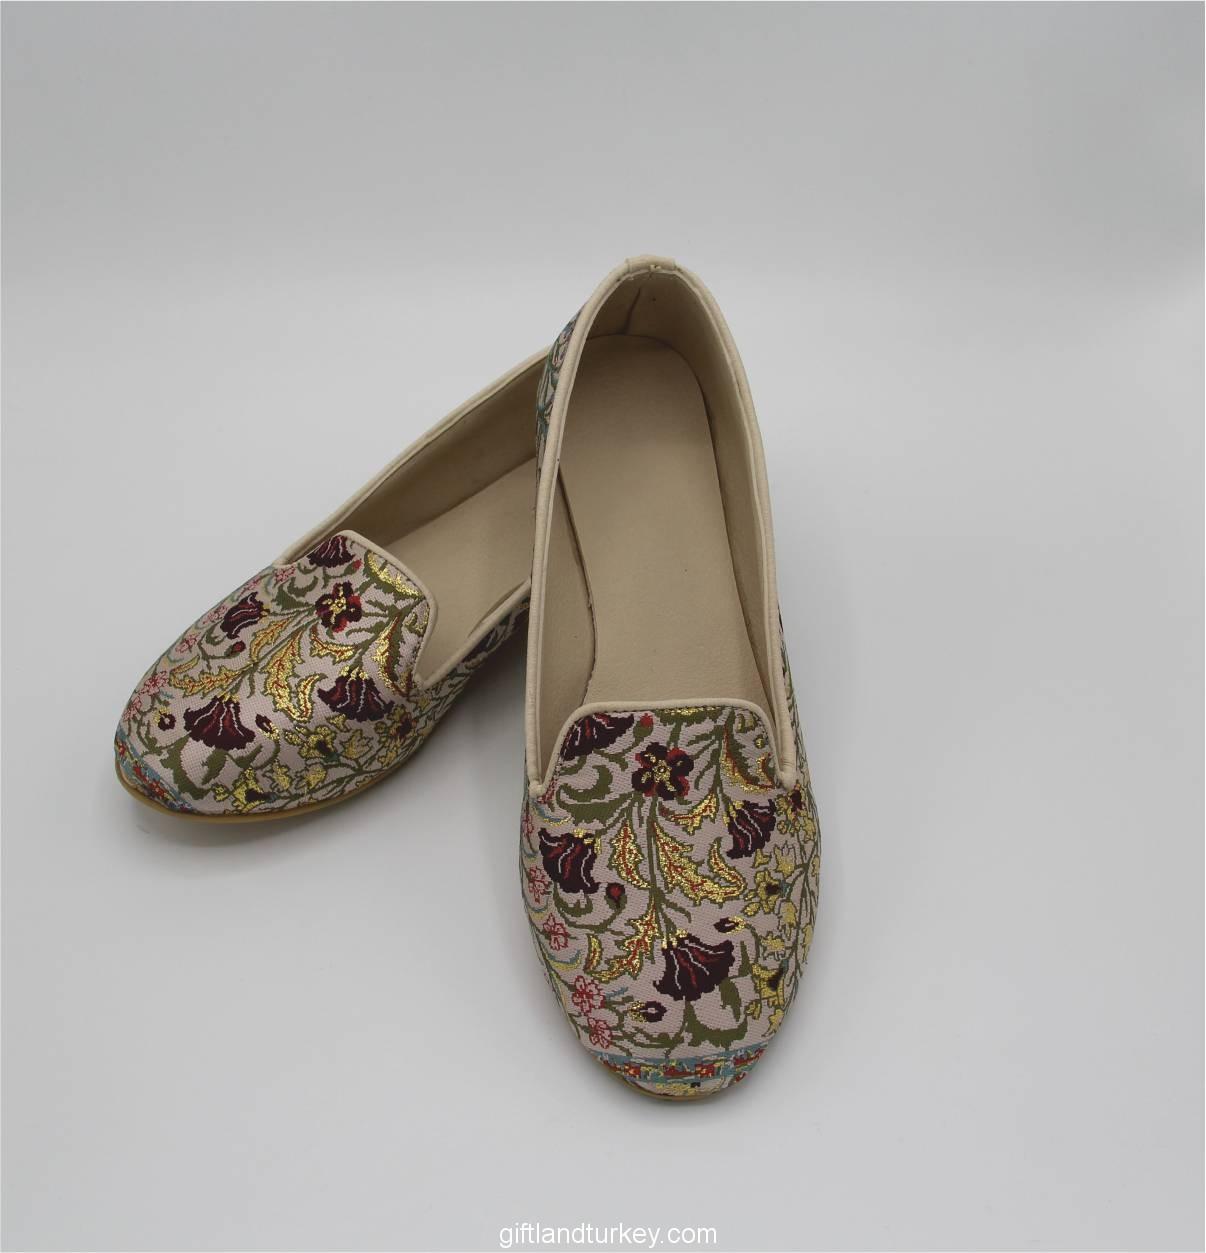 Turkish Design Shoes